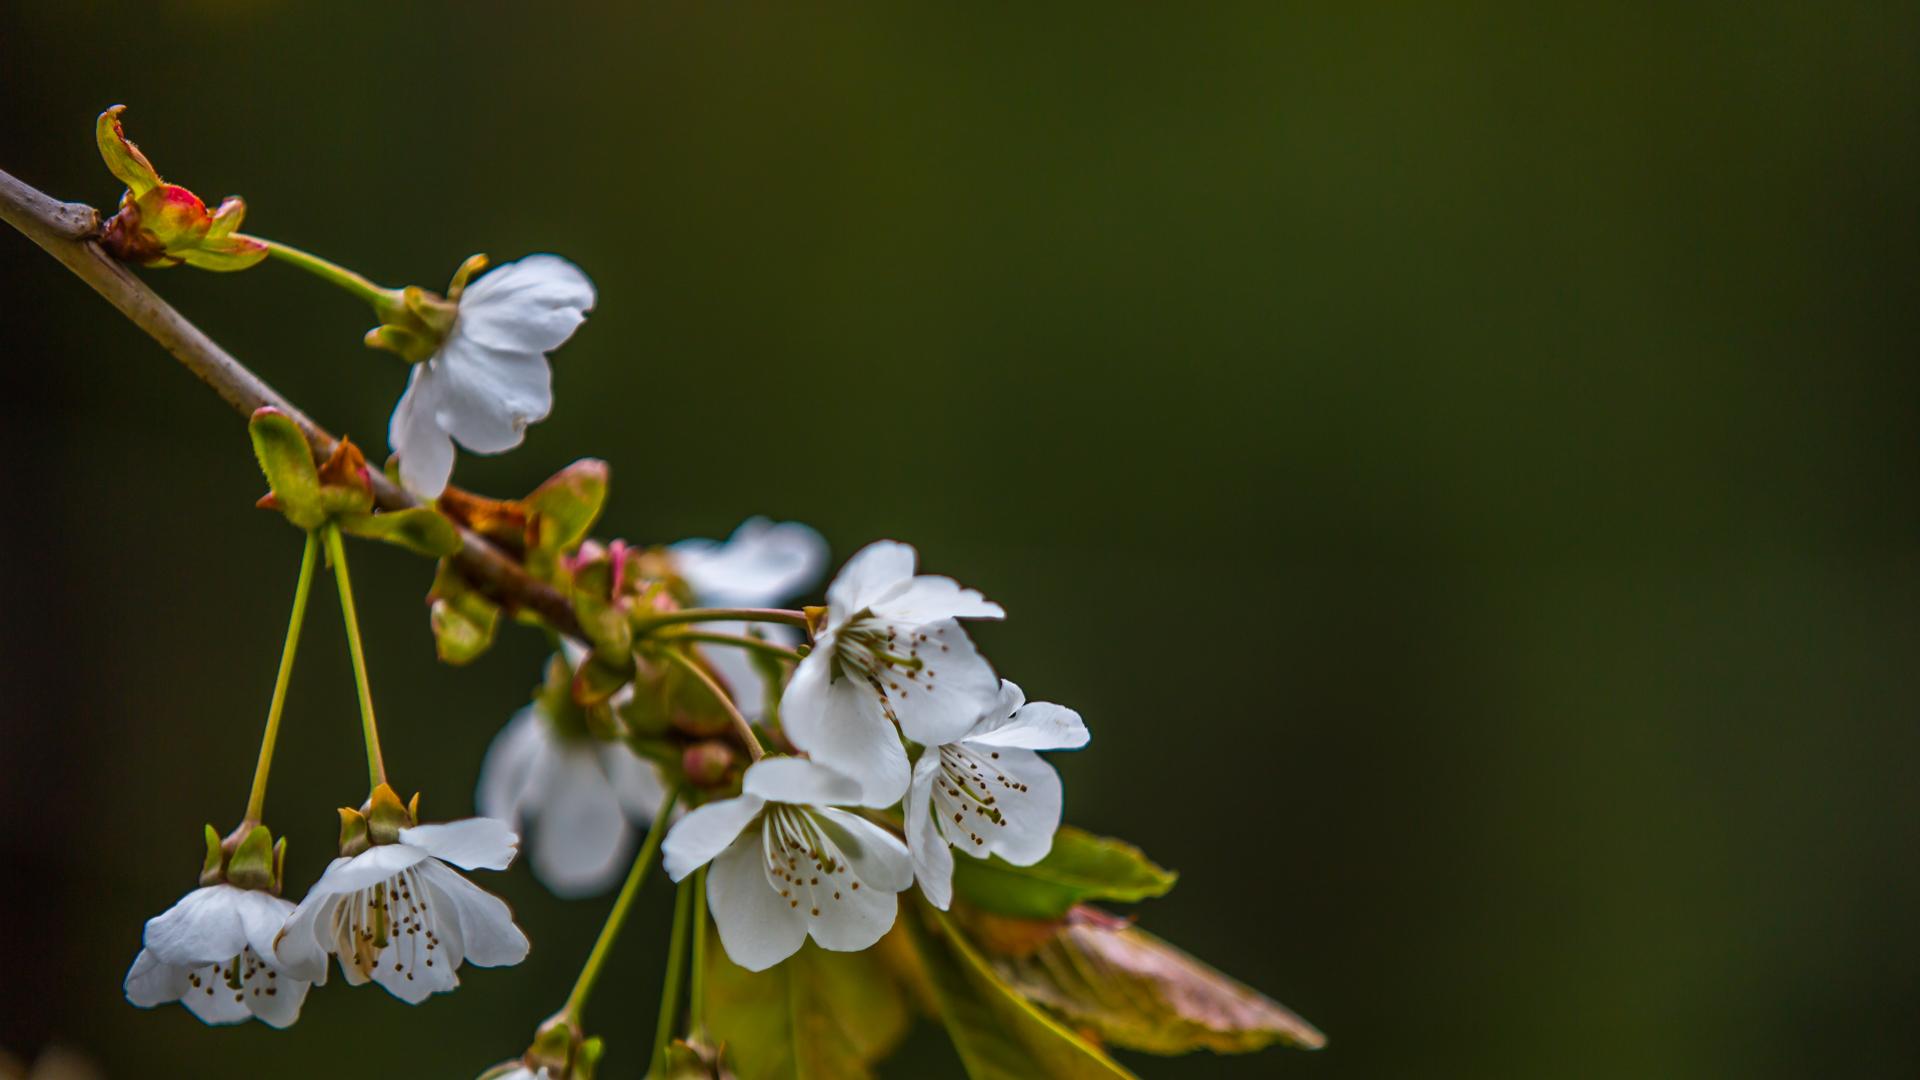 SpringCRD